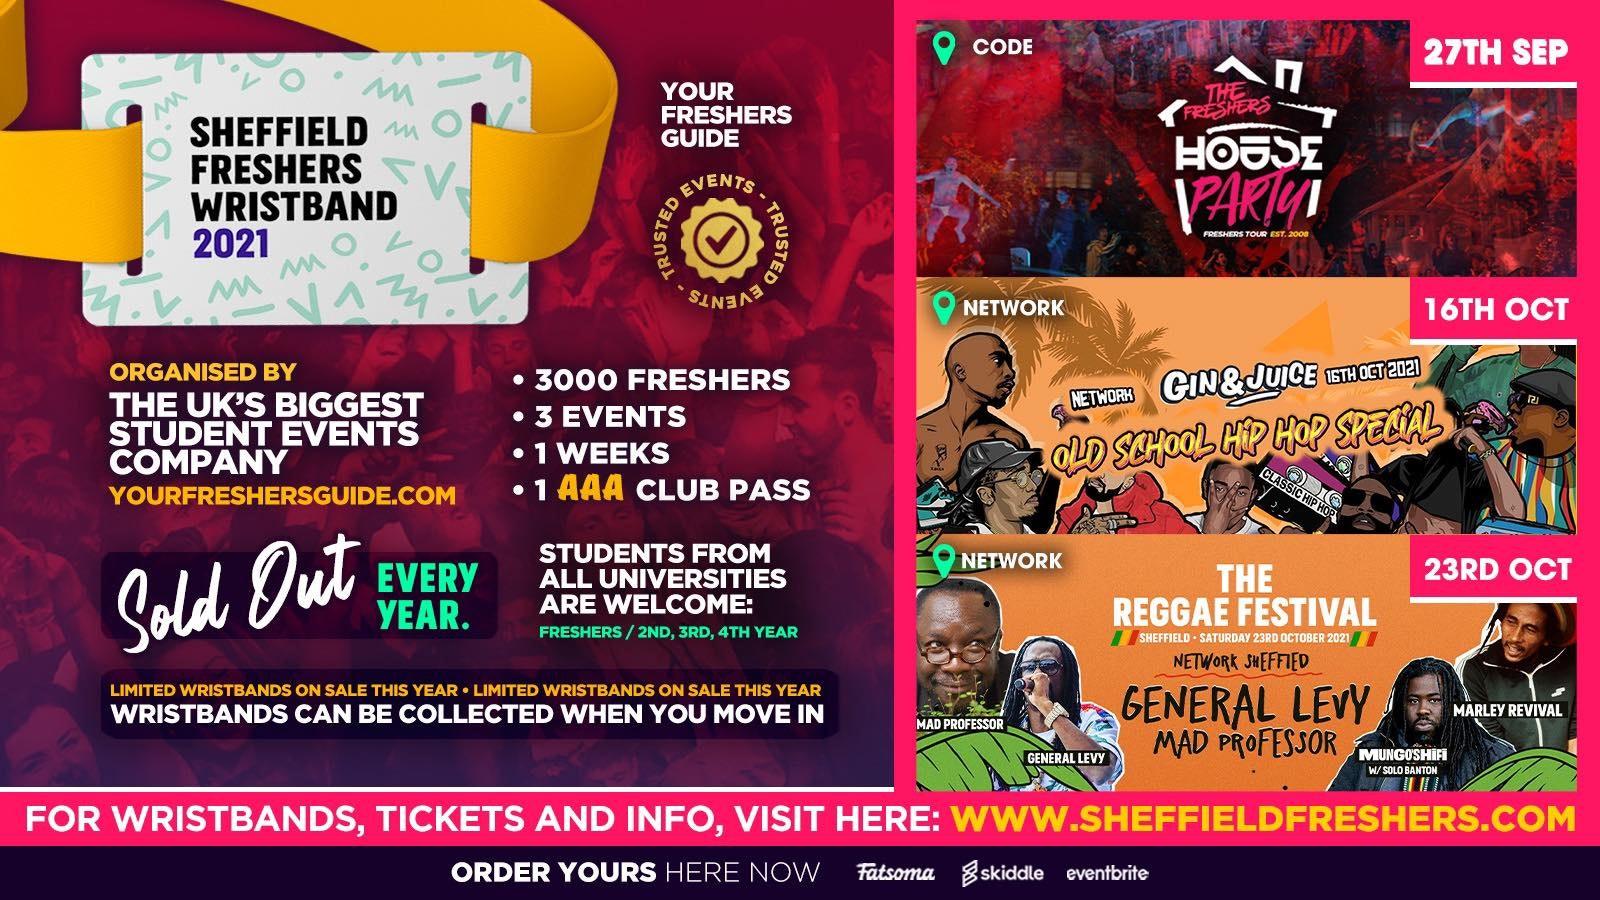 The Sheffield Freshers Wristband 2021 // Sheffield Freshers 2021